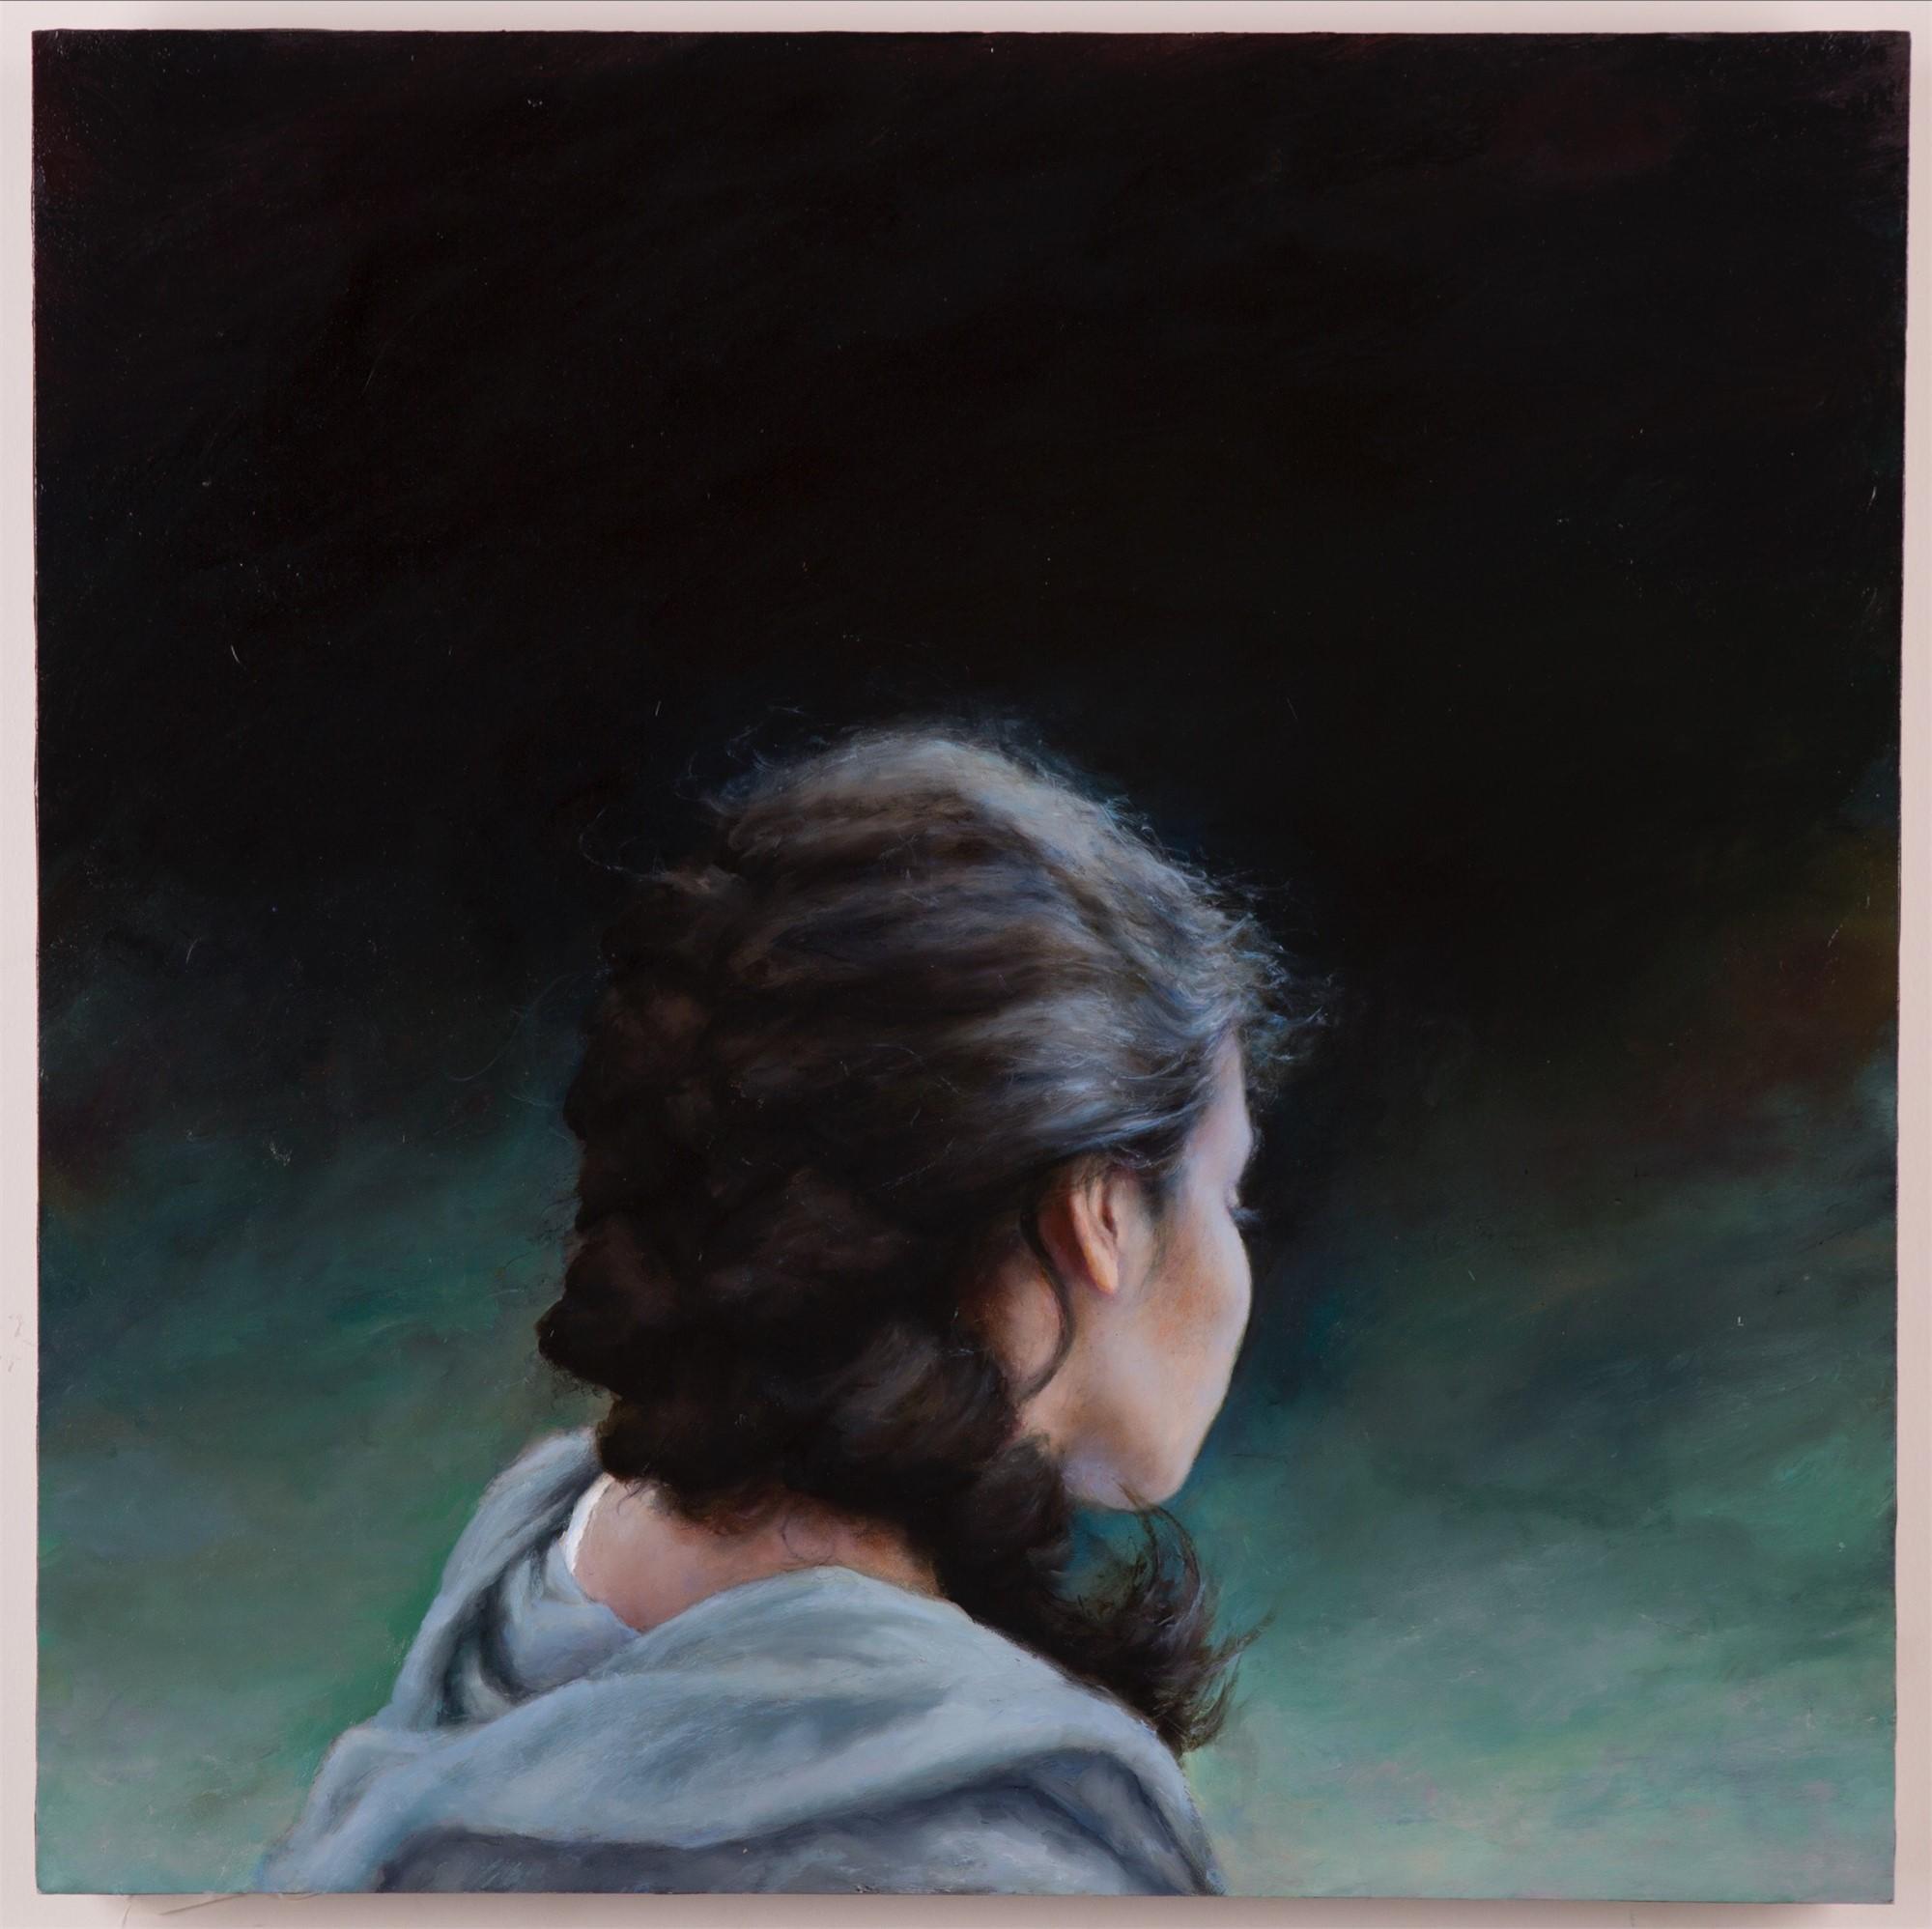 Ceci by Elsa Muñoz